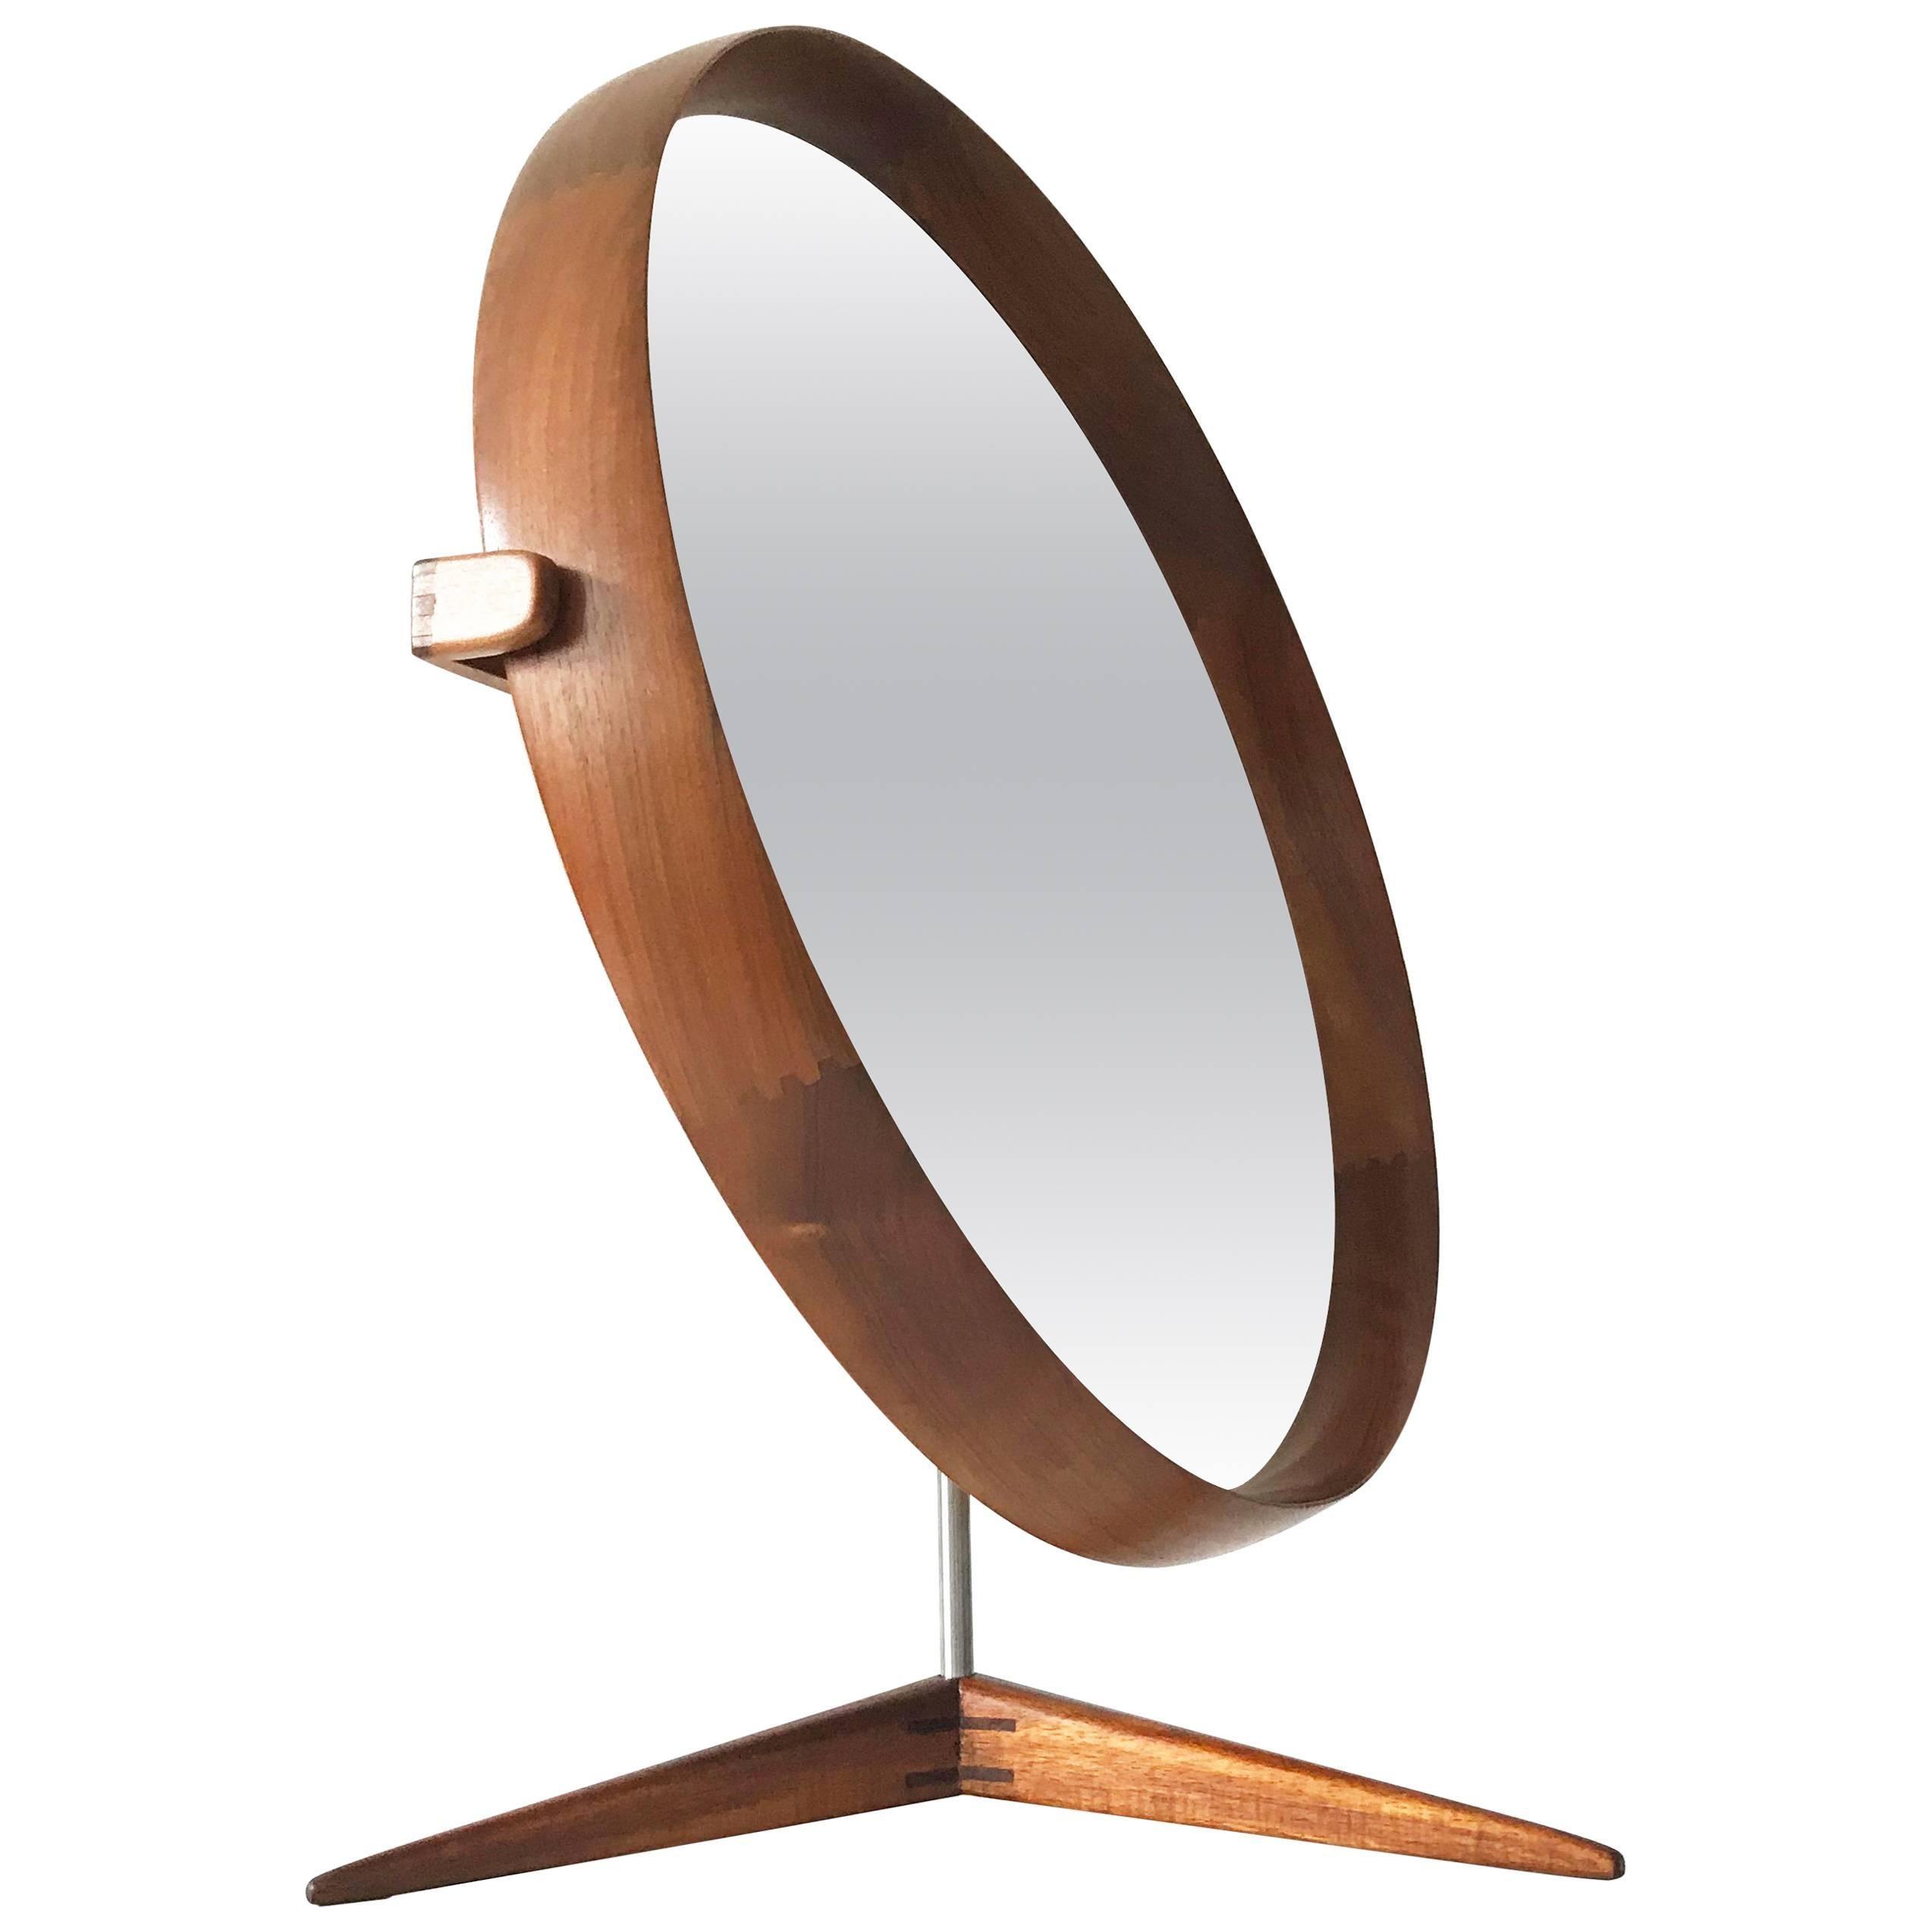 Large Teak Table Mirror by Uno & Östen Kristiansson for Luxus Sweden 1960s